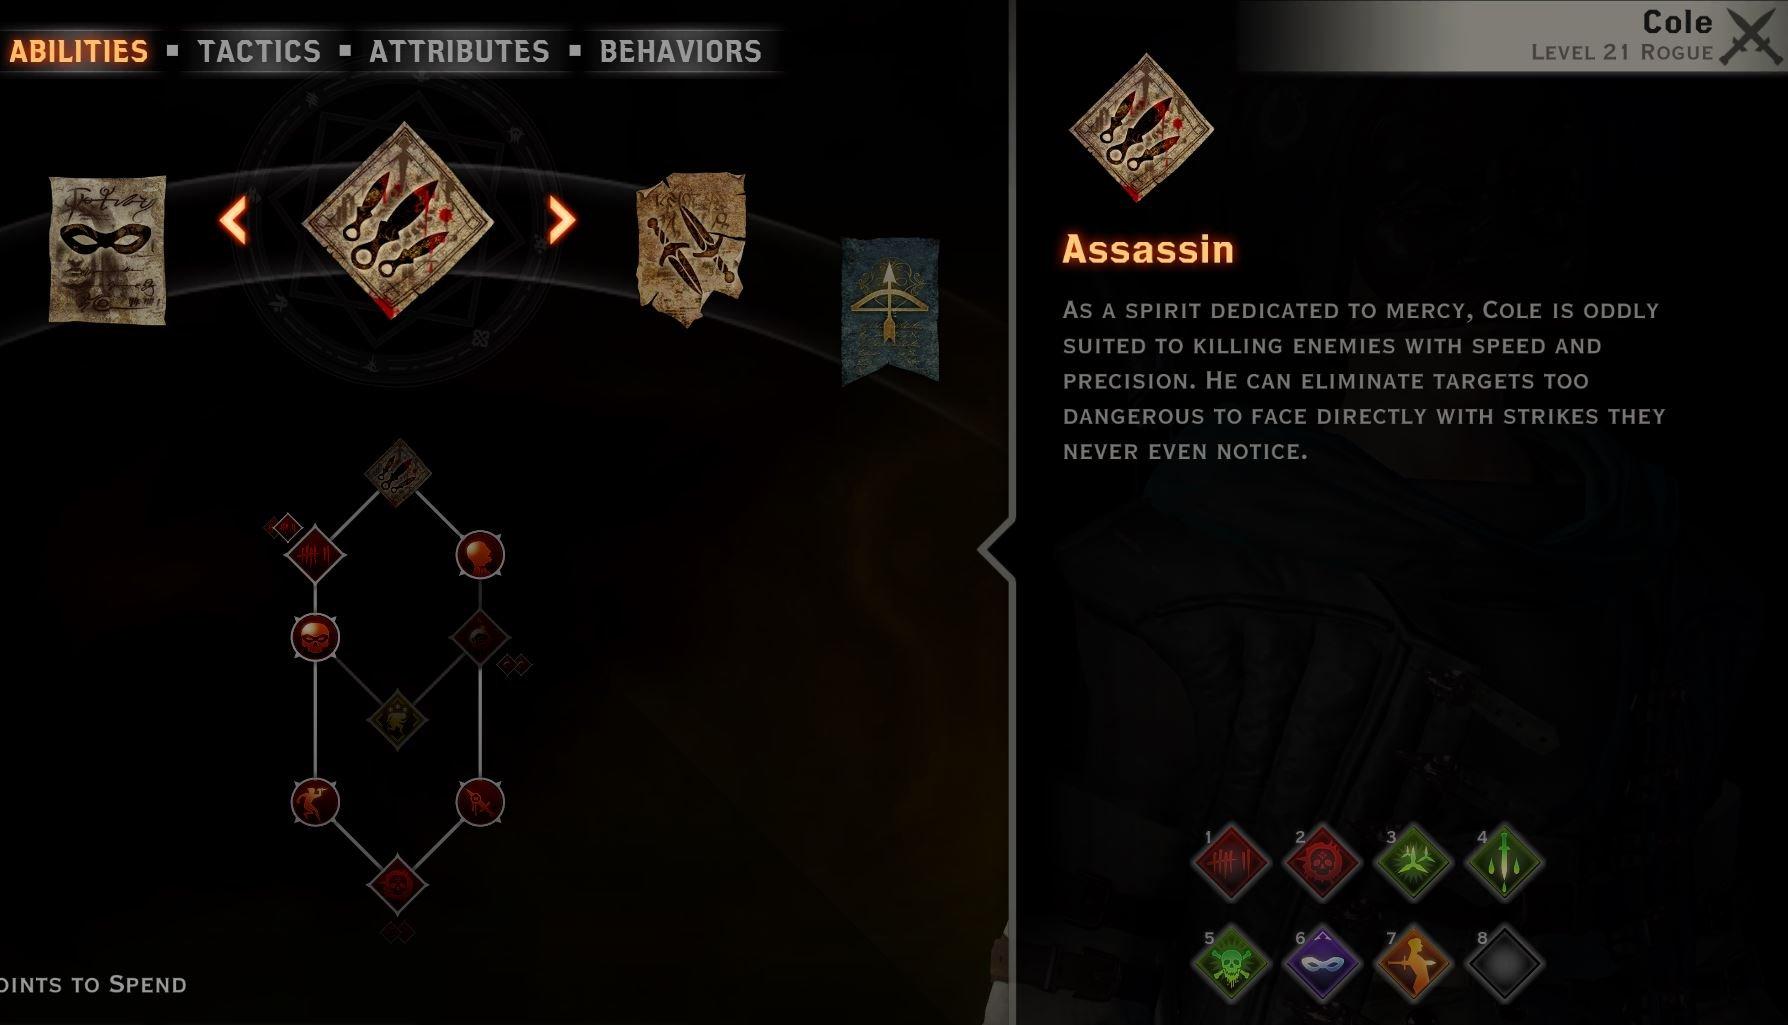 Cole dw build Assassin tree.JPG